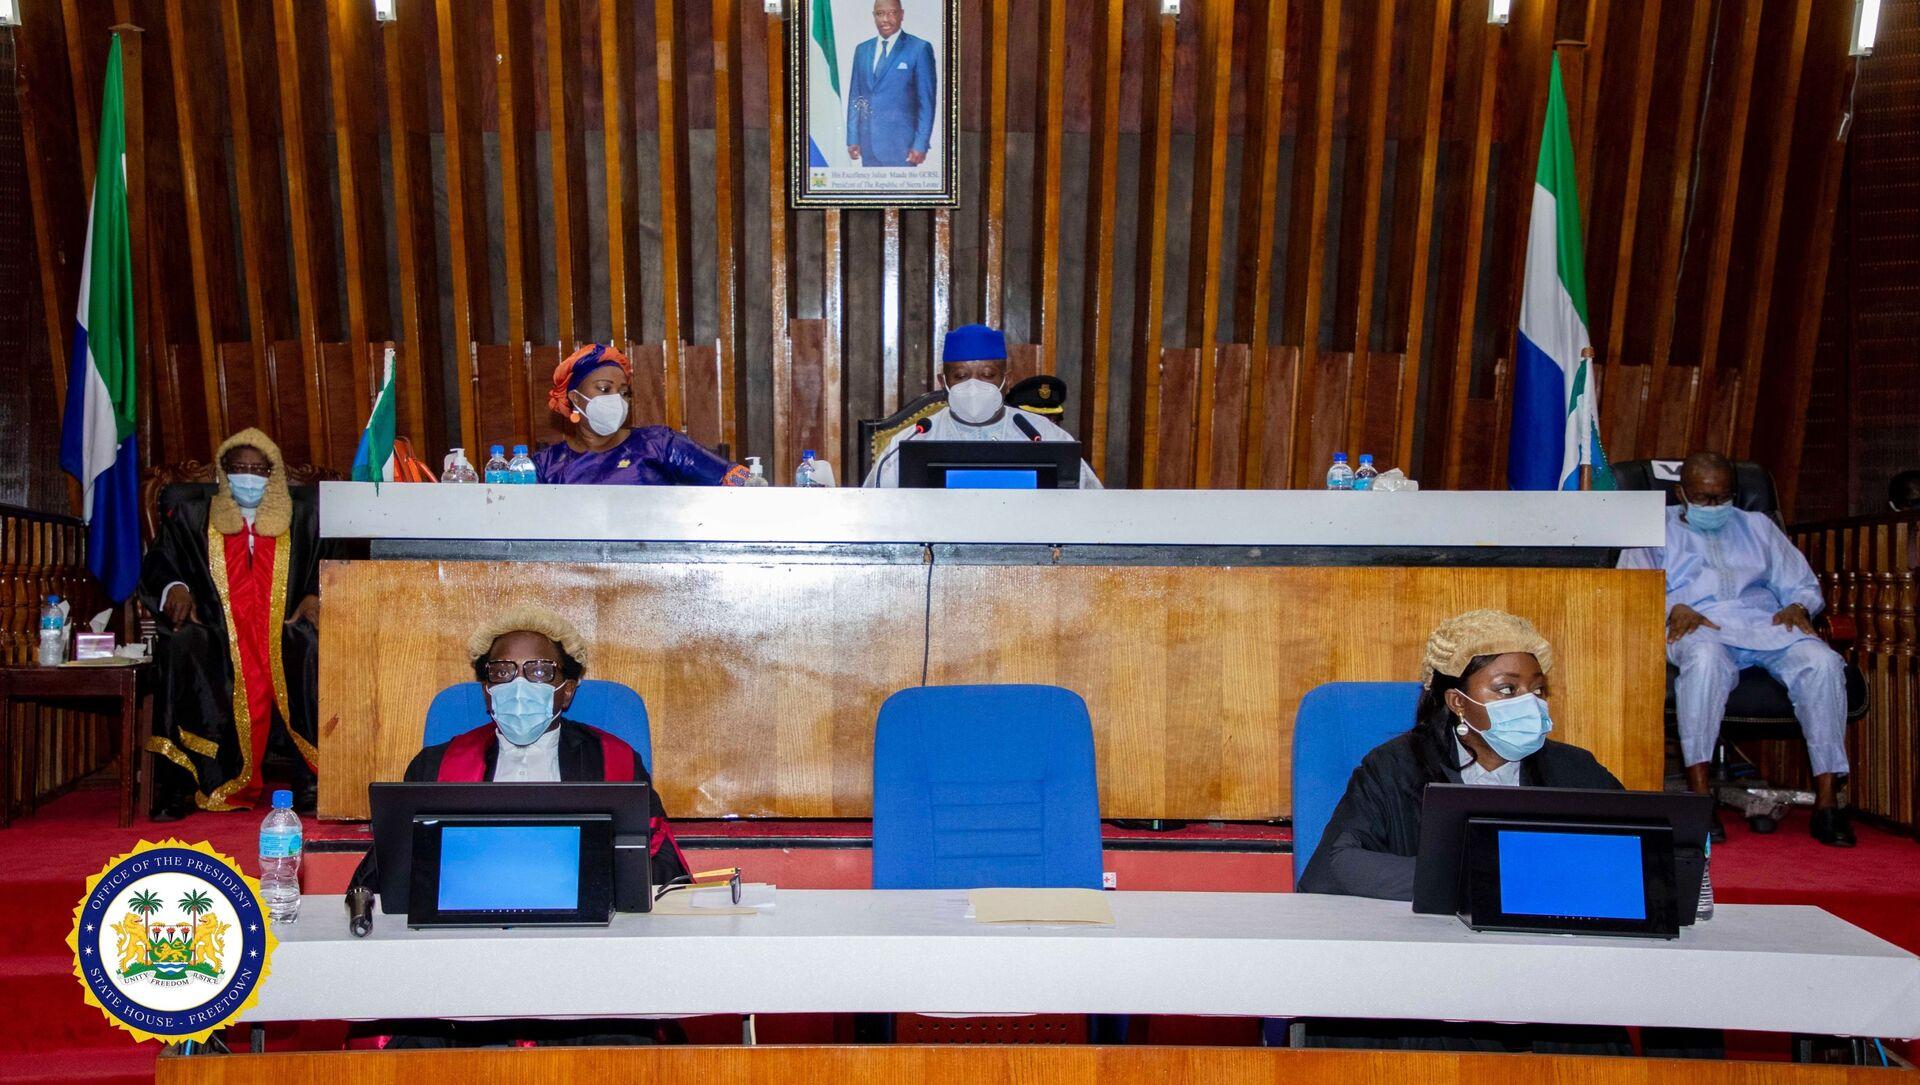 Sierra Leone parliament voted to abolish death penalty on July 23, 2021 - Sputnik International, 1920, 23.07.2021